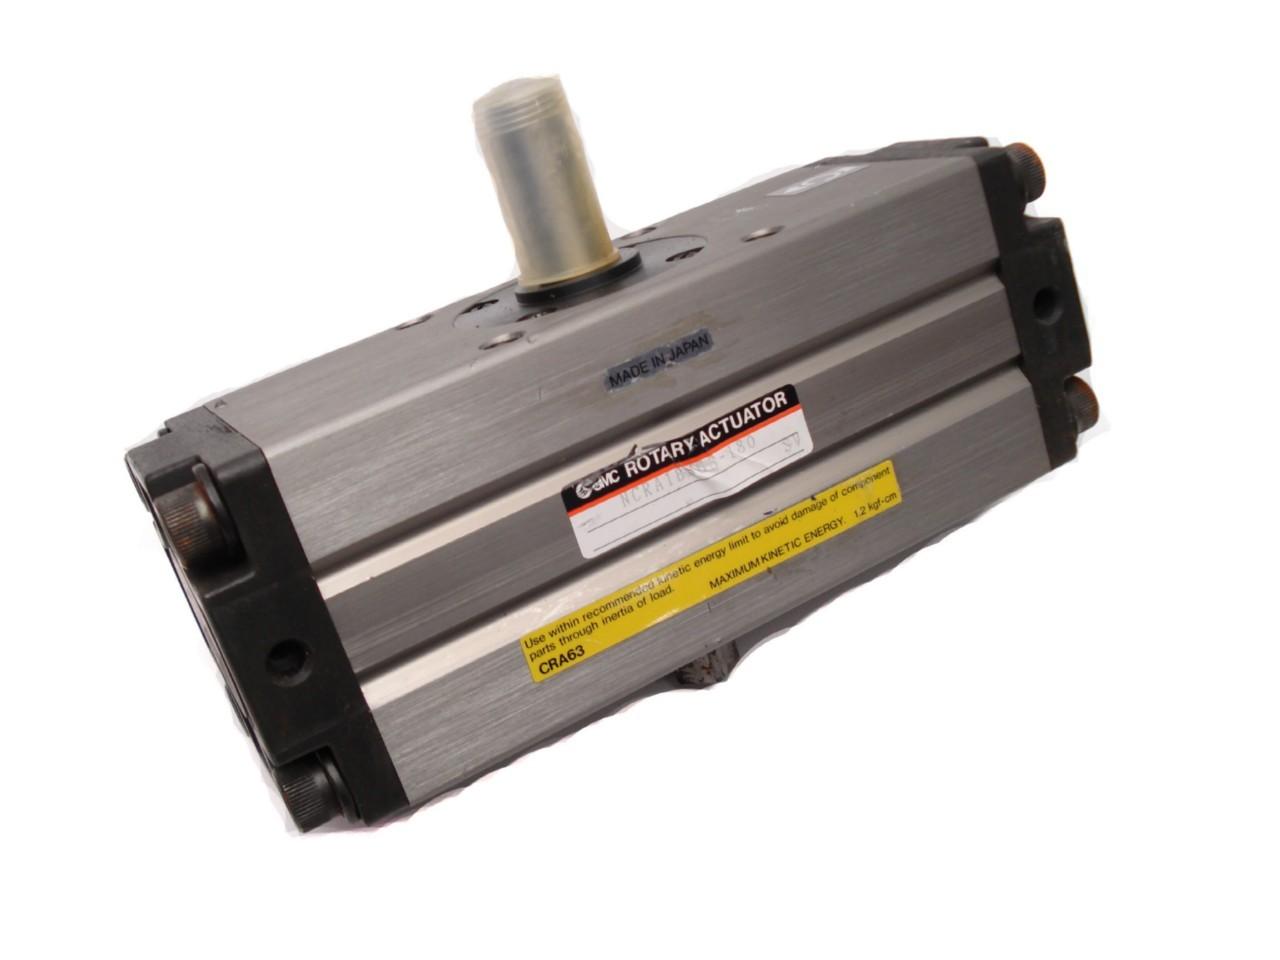 New Smc Rack Amp Pinion Type Rotary Actuator Ncra1bw63 180